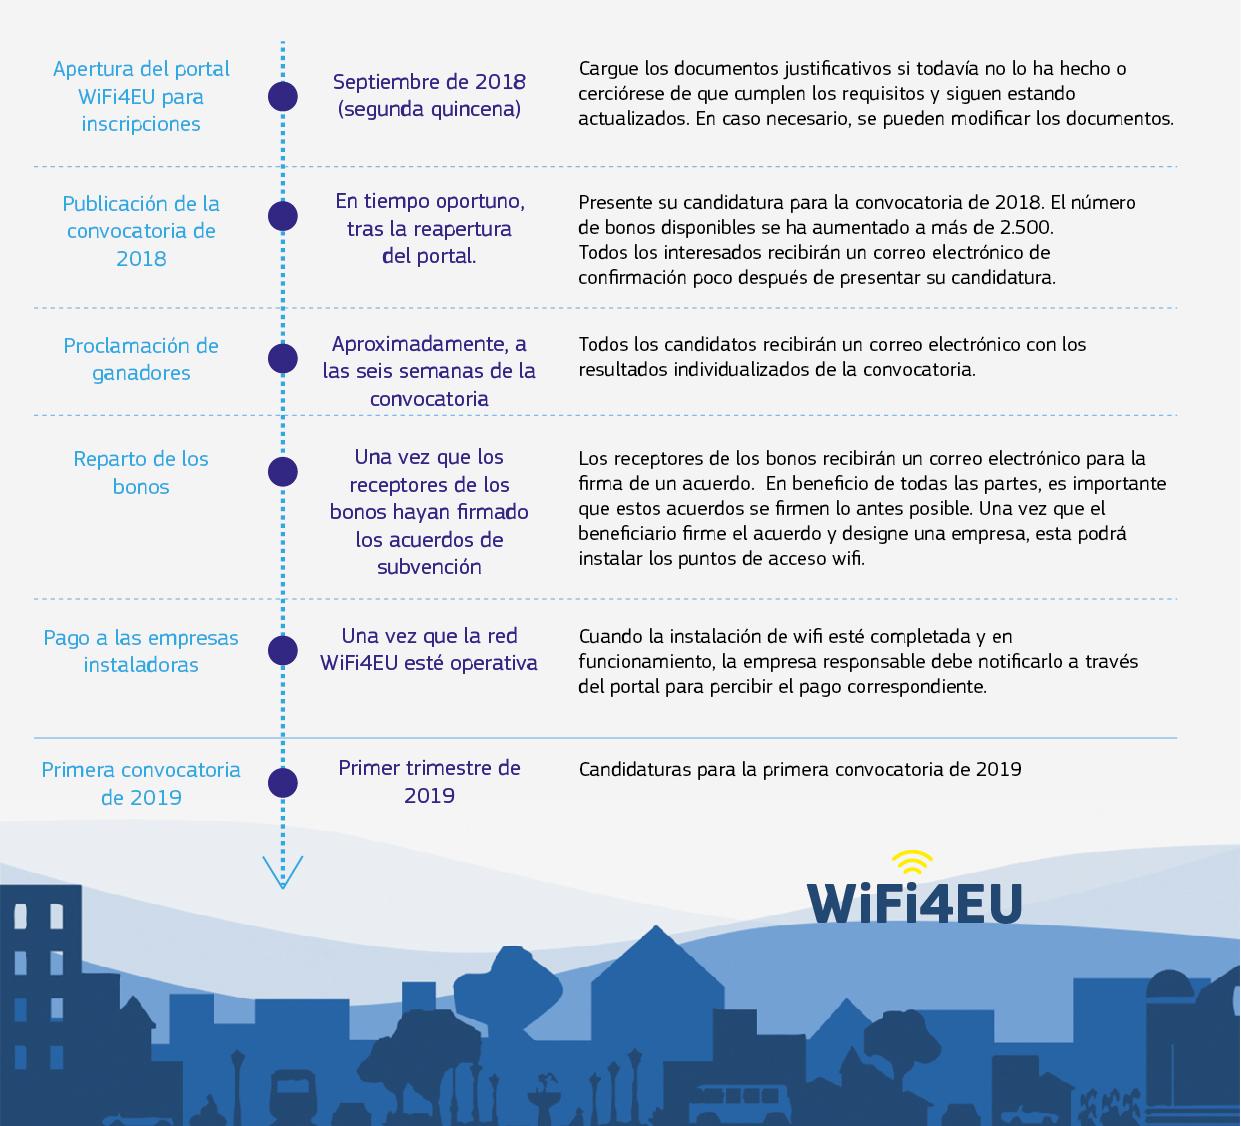 Hoja de ruta de WiFi4EU (publicada a finales de agosto de 2018)